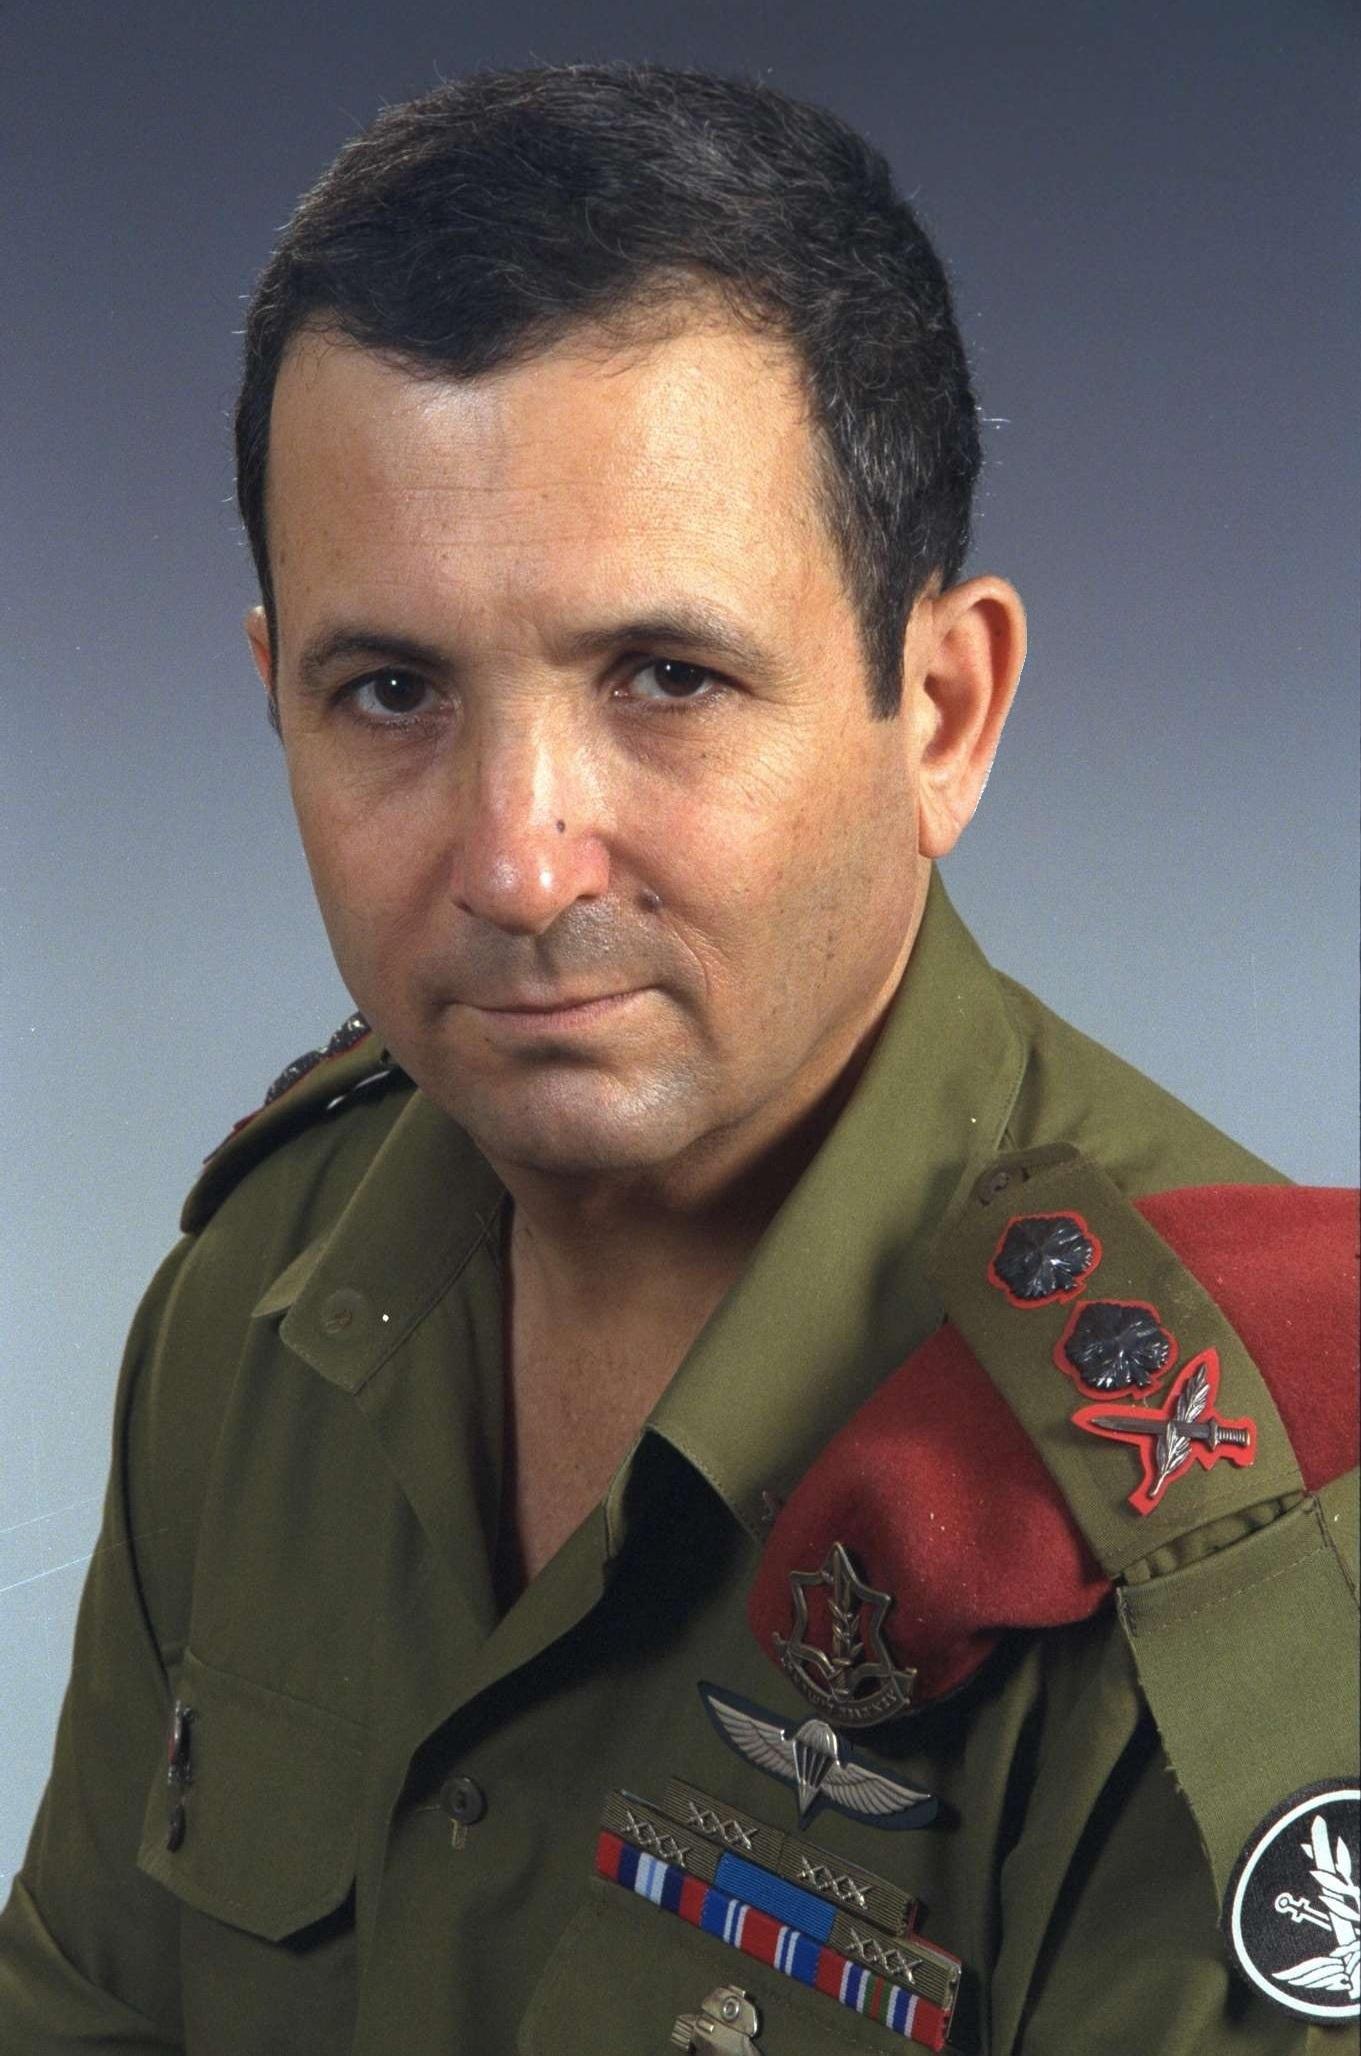 ����ehud barak militaryjpg � ��������